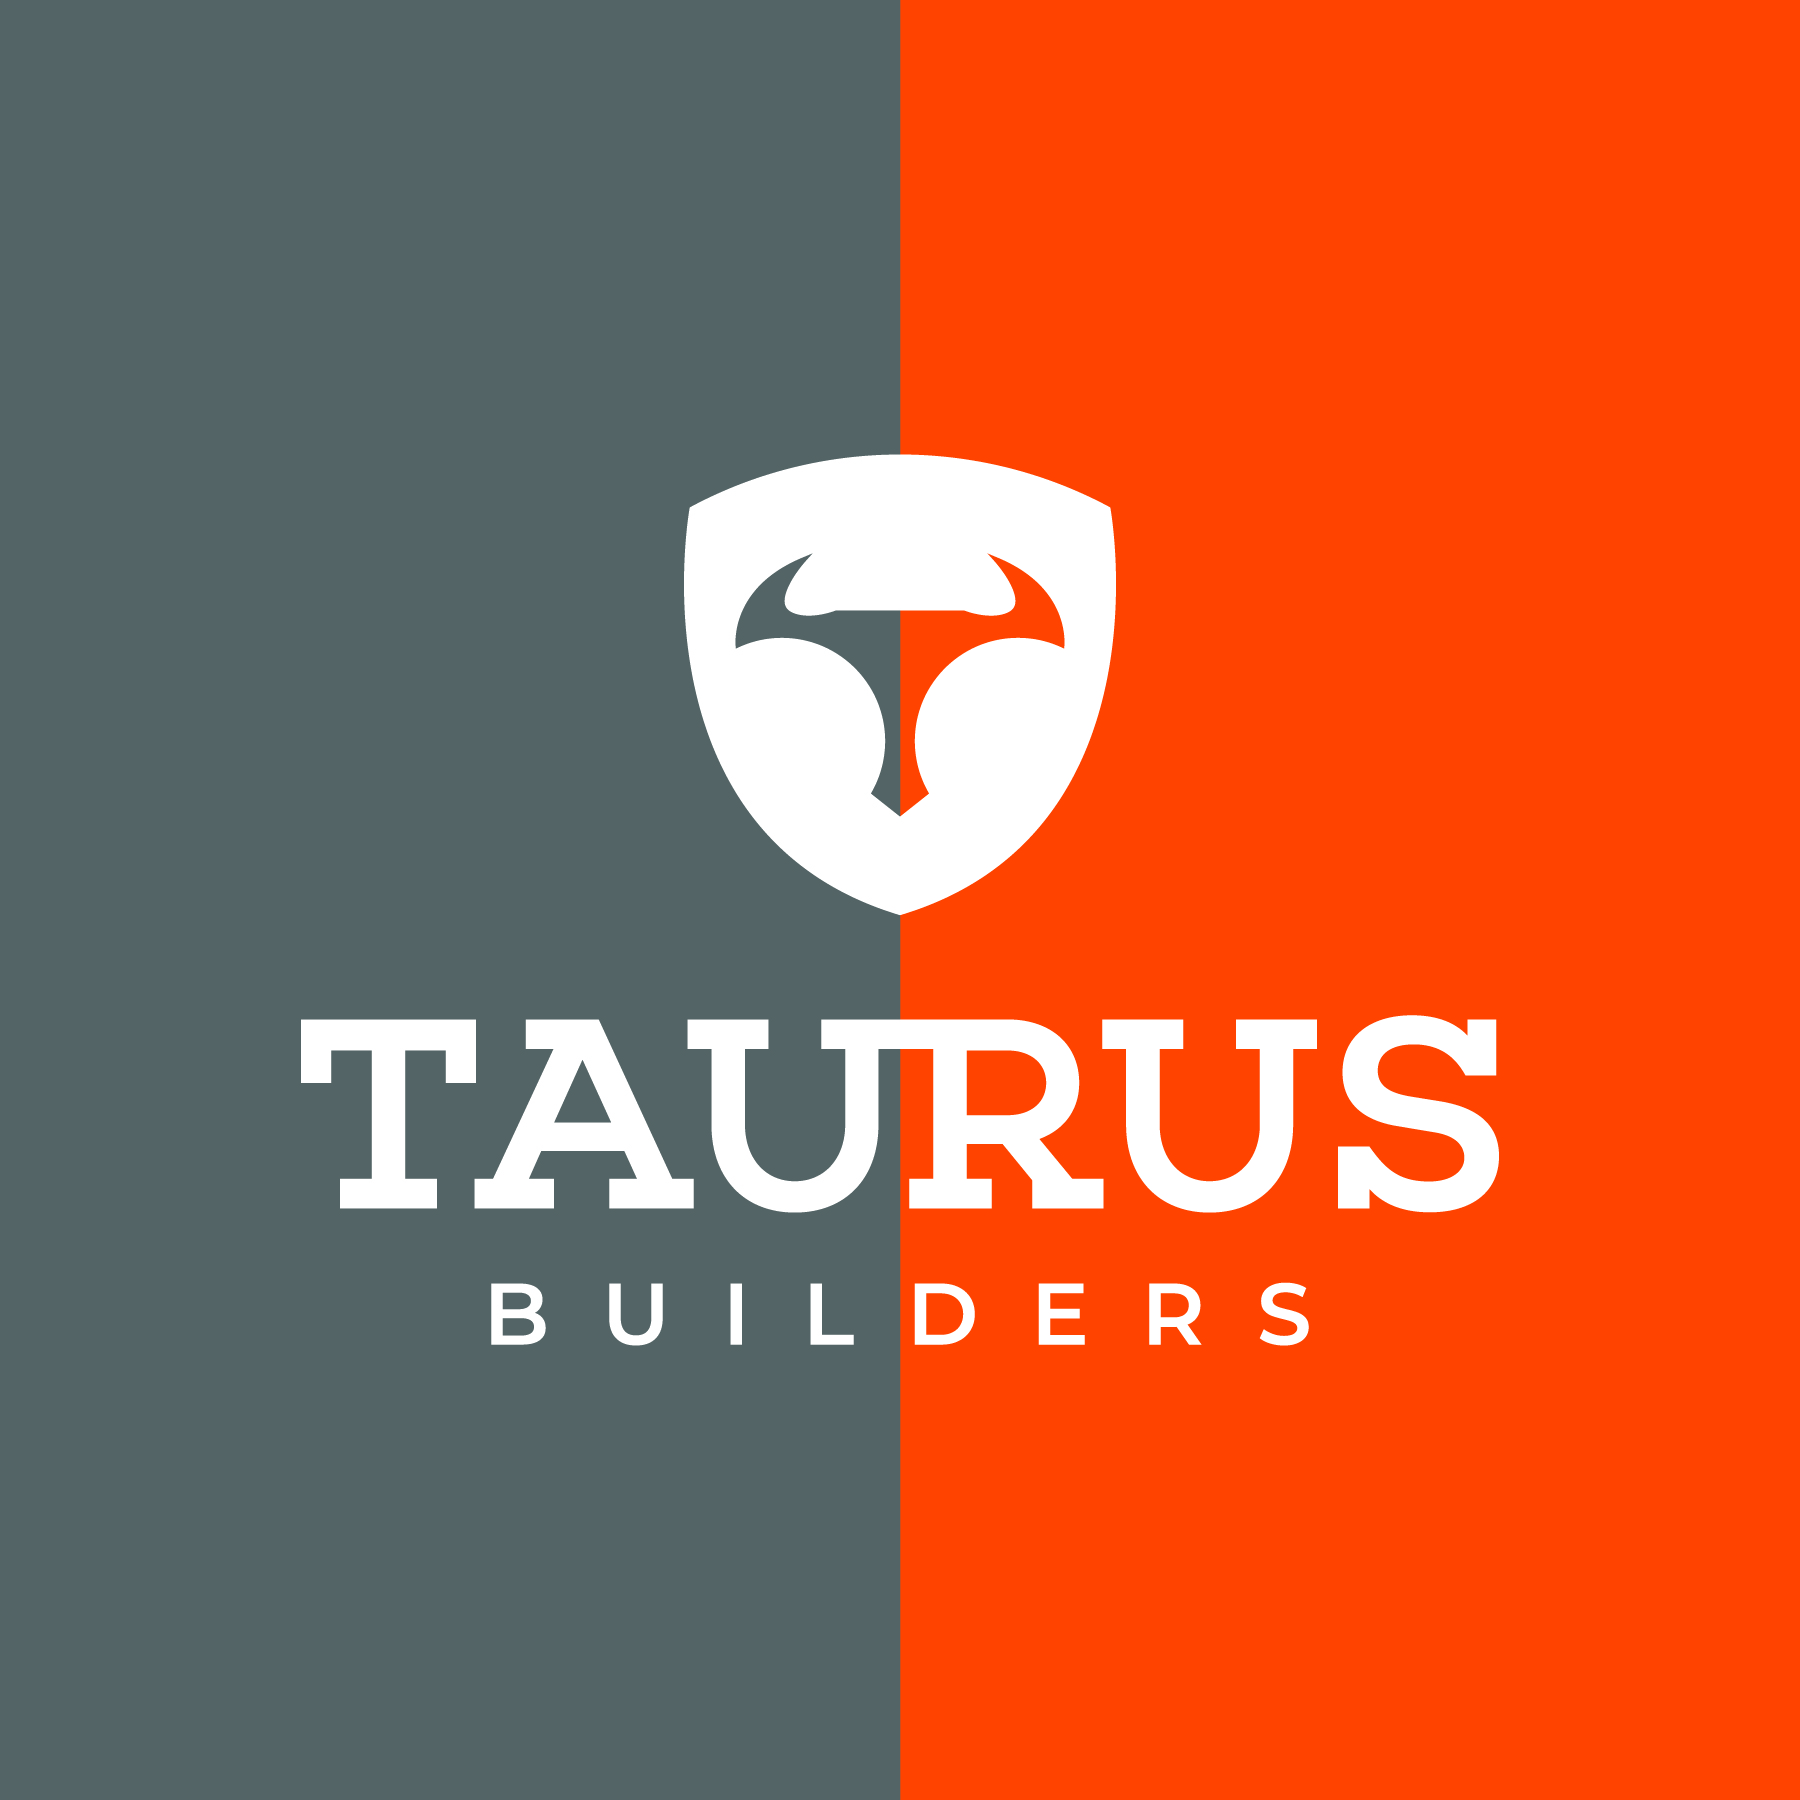 taurus-01.jpg